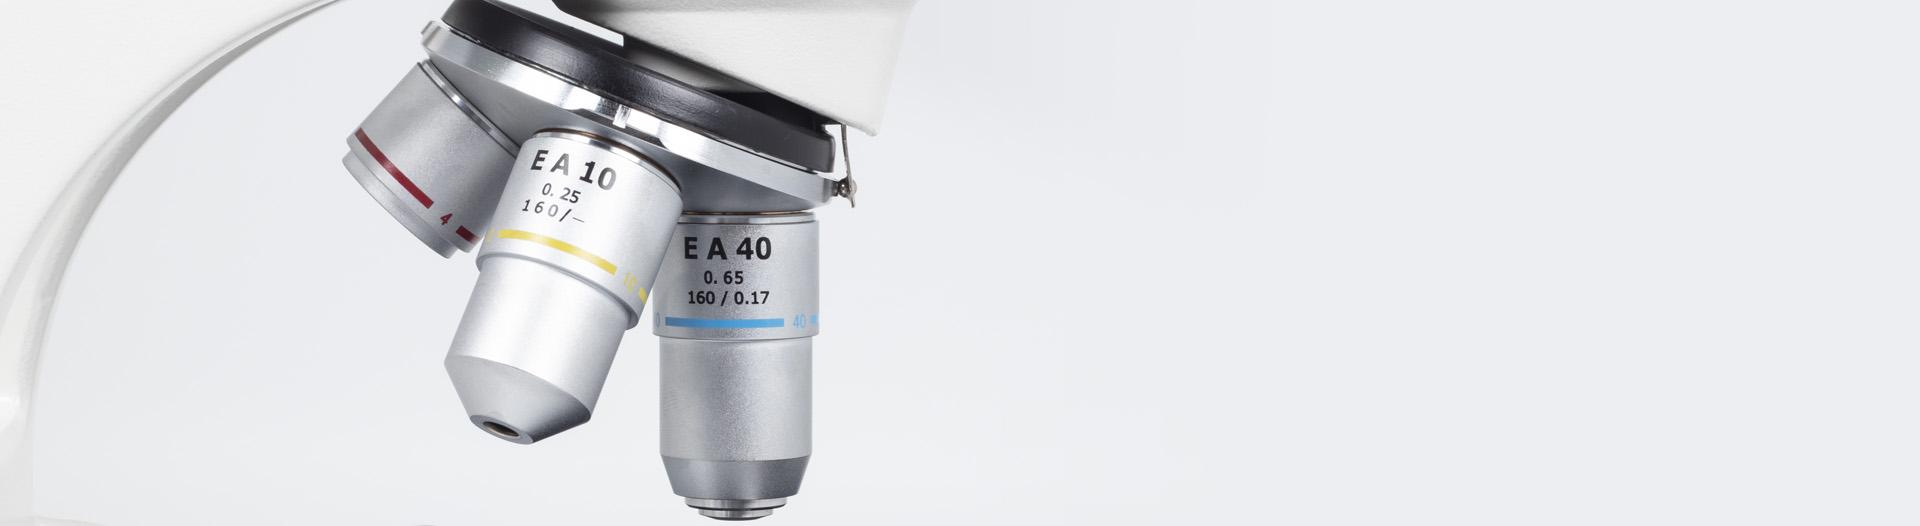 BA80 microscope Optics